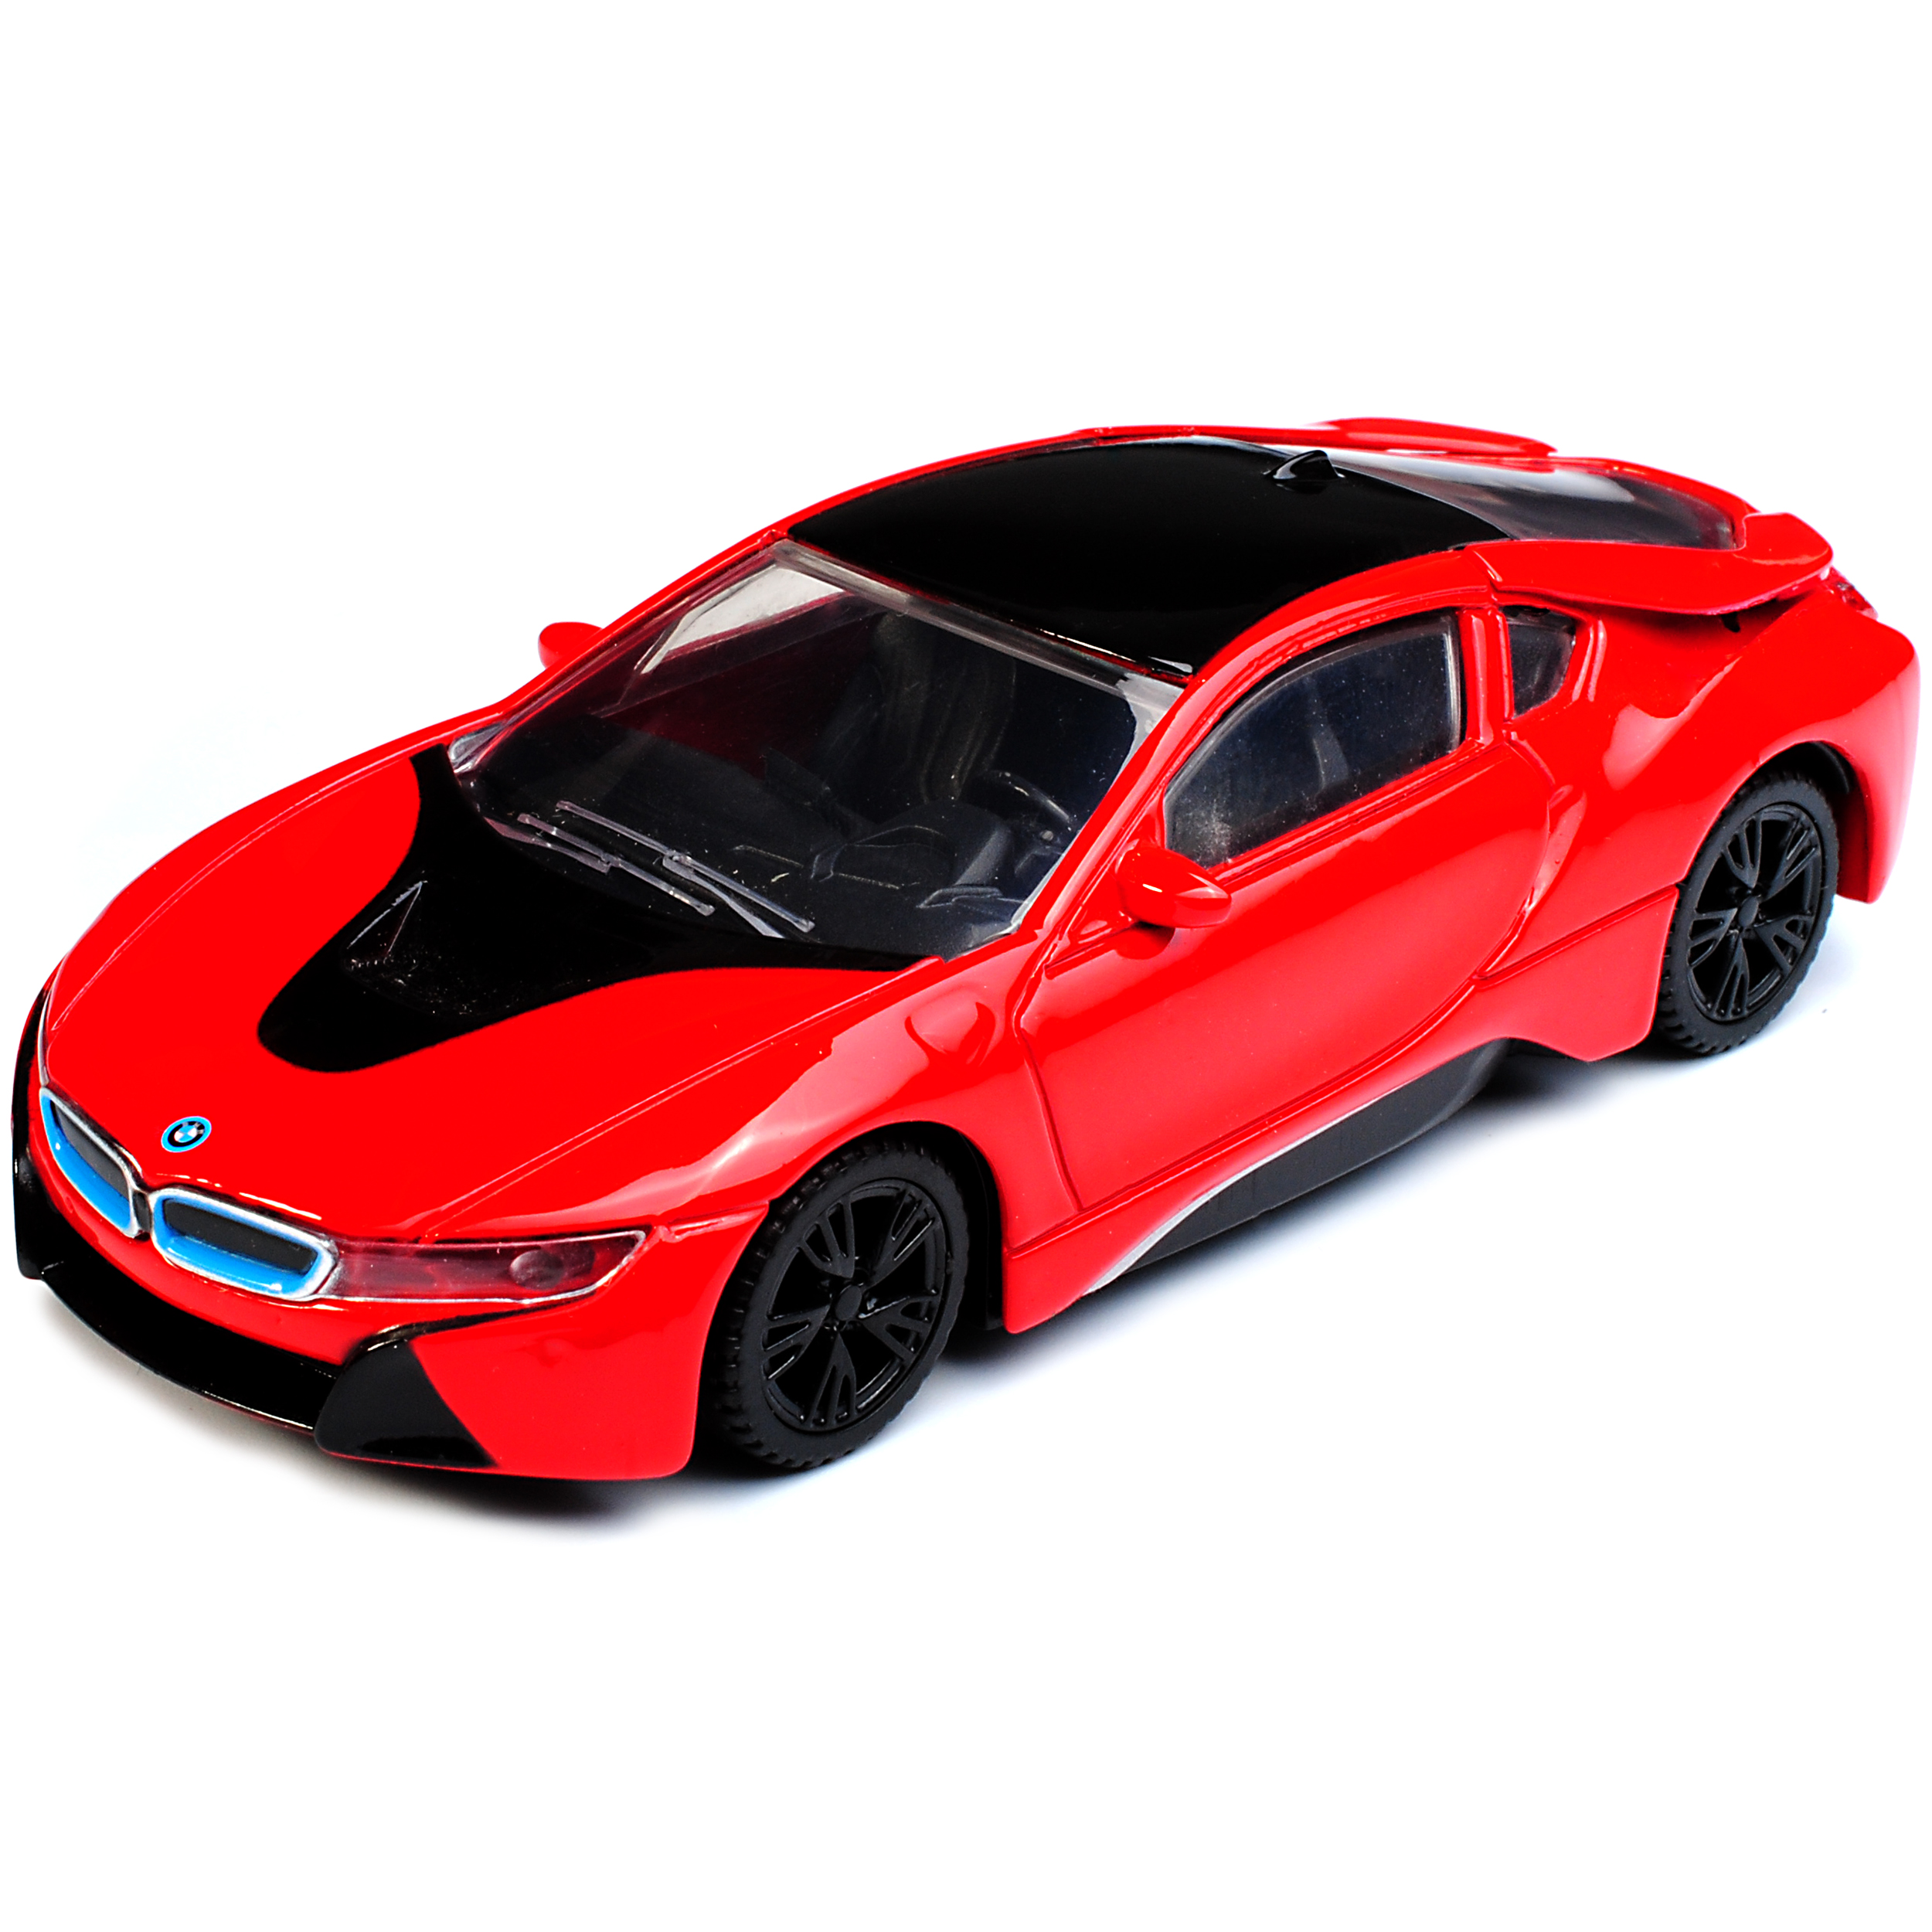 Rojo BMW I8 Coupé del Rastar 2013 1//43 modelismo coches con o sin individiuellem...